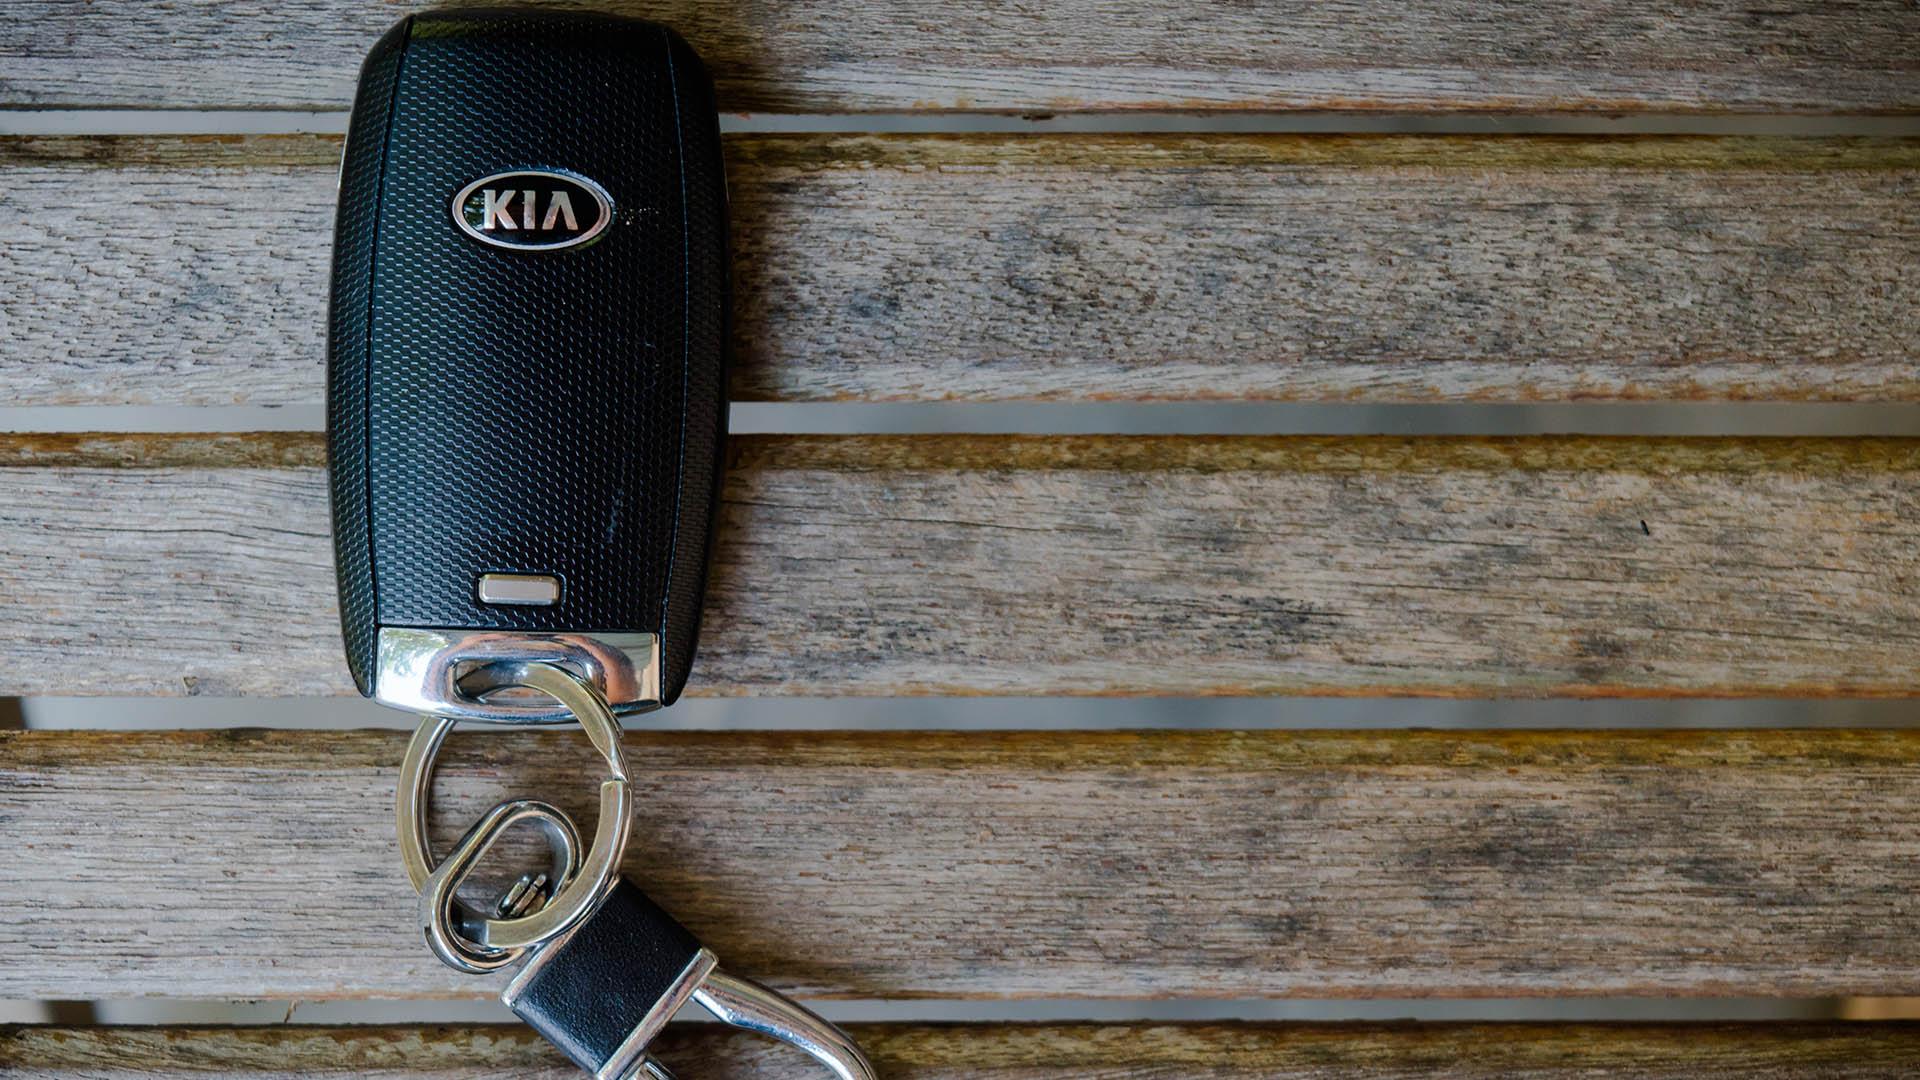 Heartland Bank (ASX:HGH) launches Kia Finance